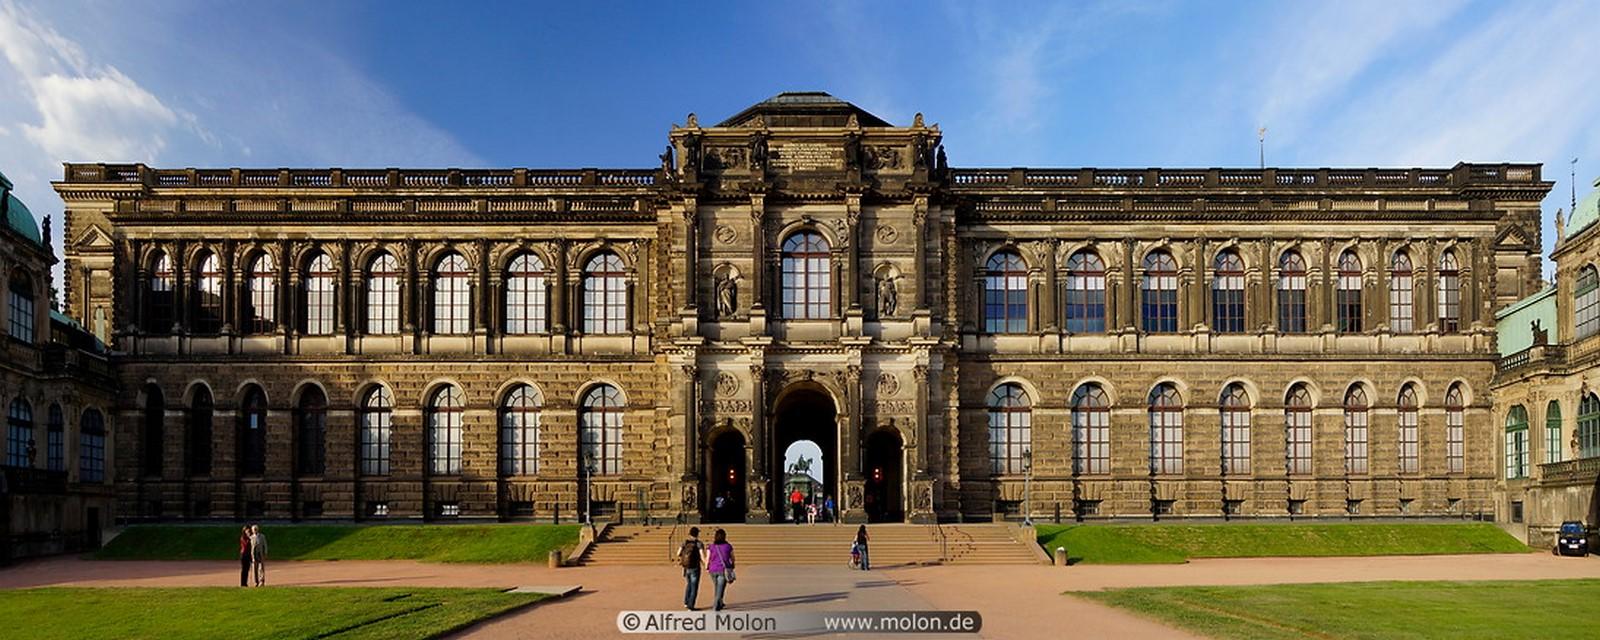 Rebuilding the City: Dresden - Sheet5